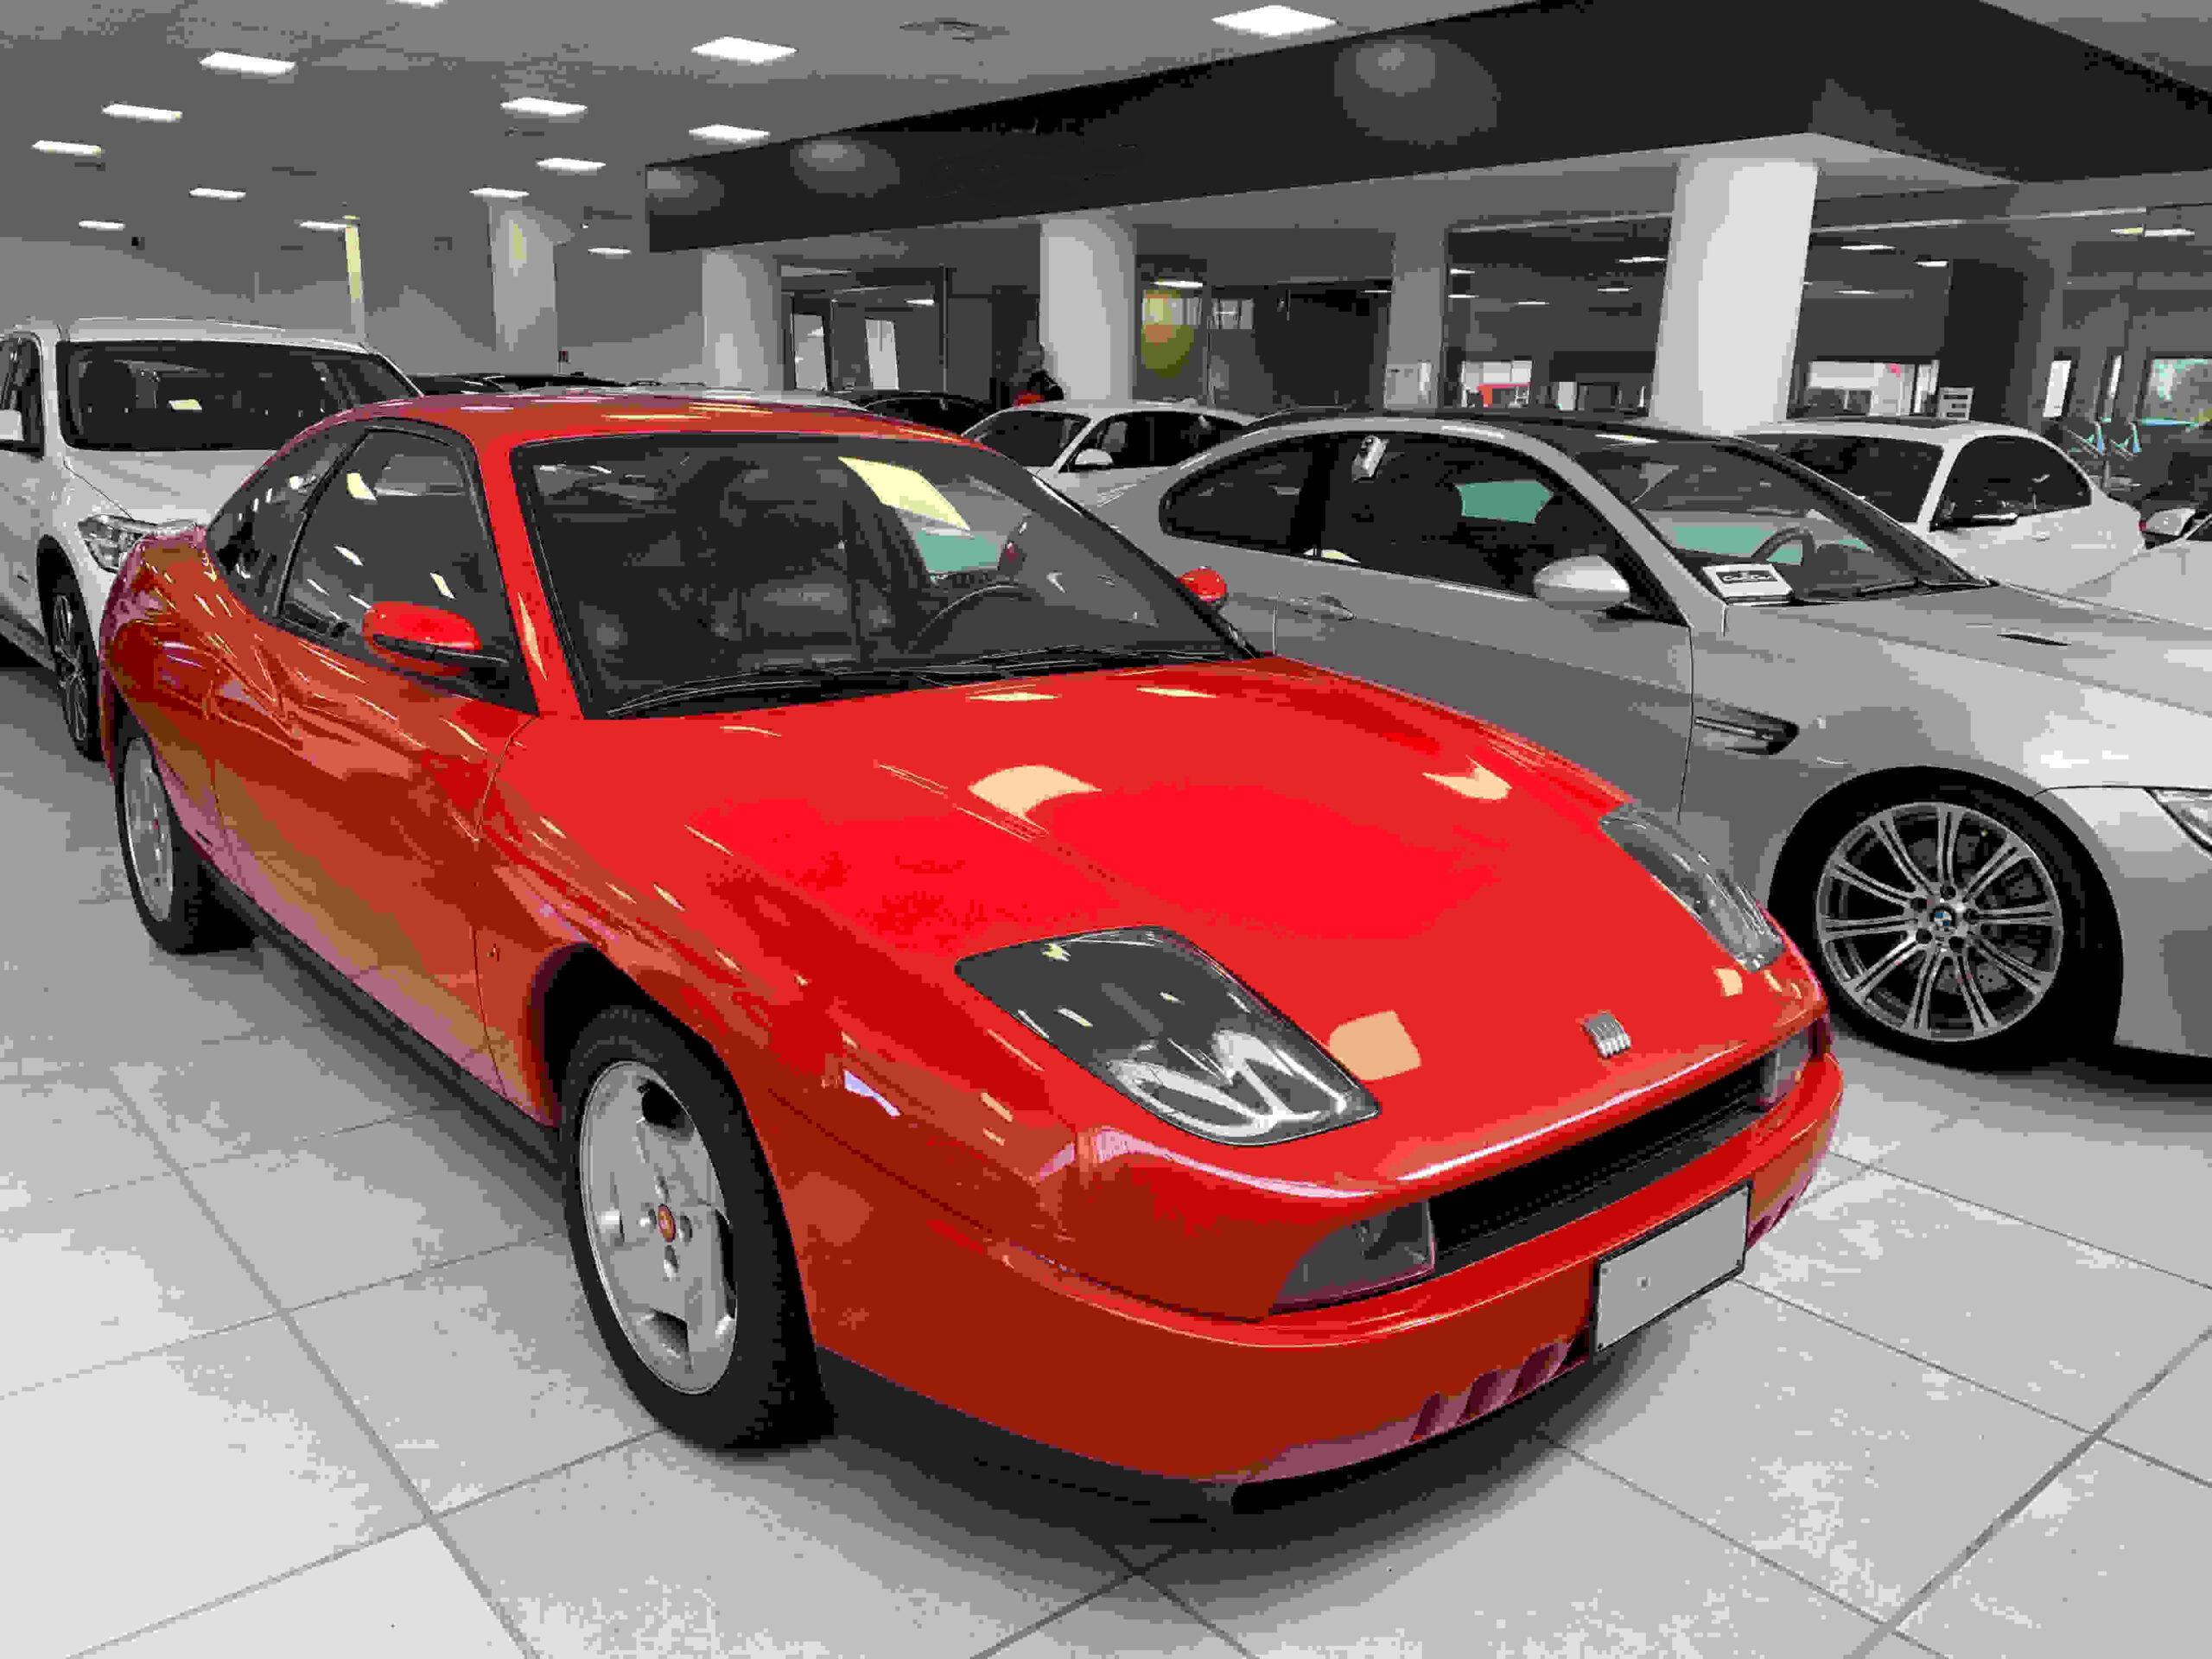 Fiat Turbo Coupe